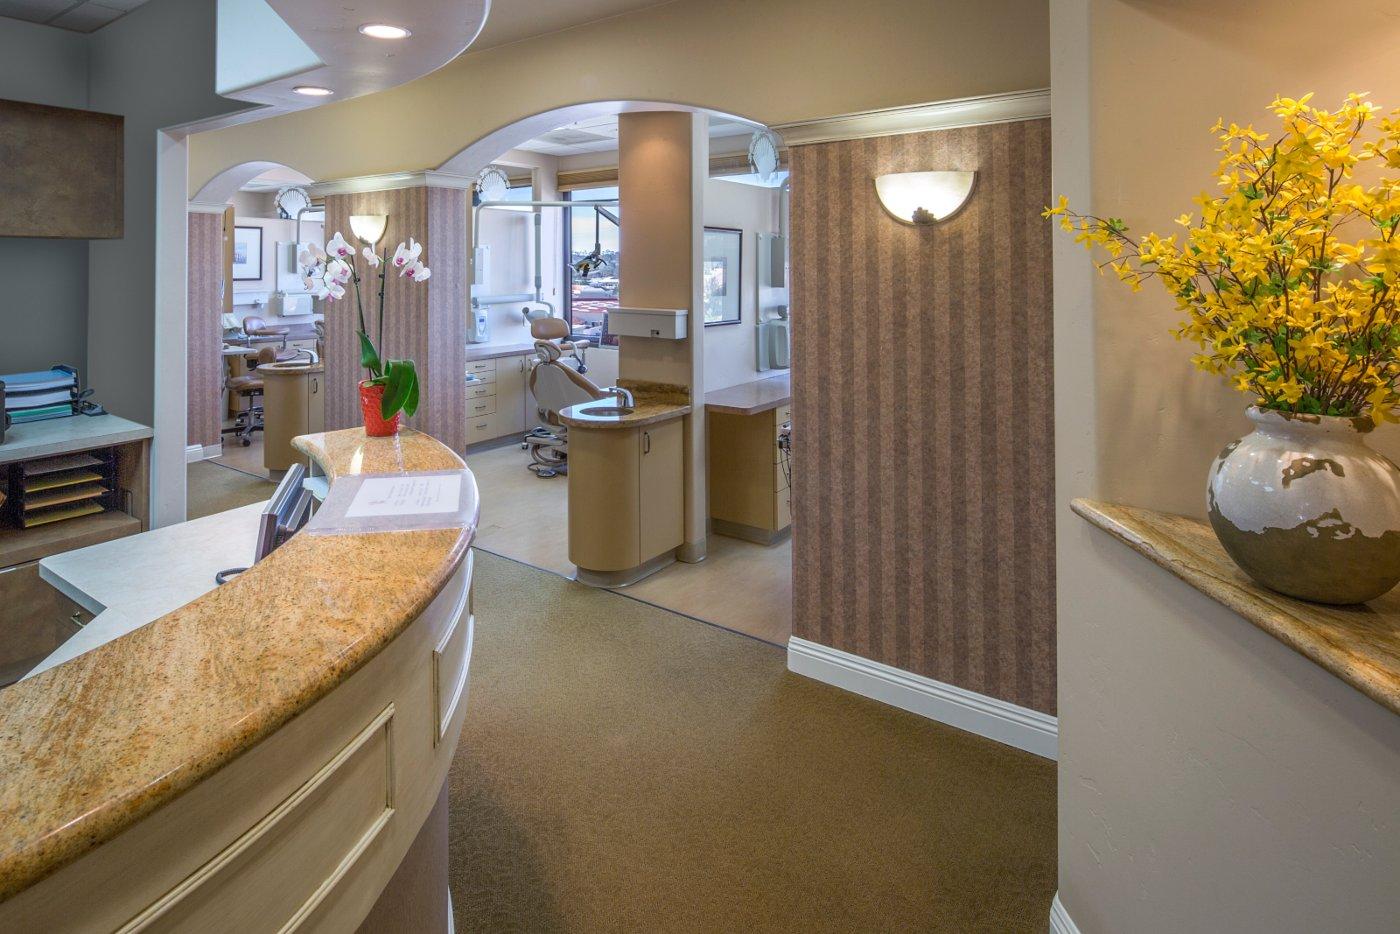 The office at Carmel Valley Dental